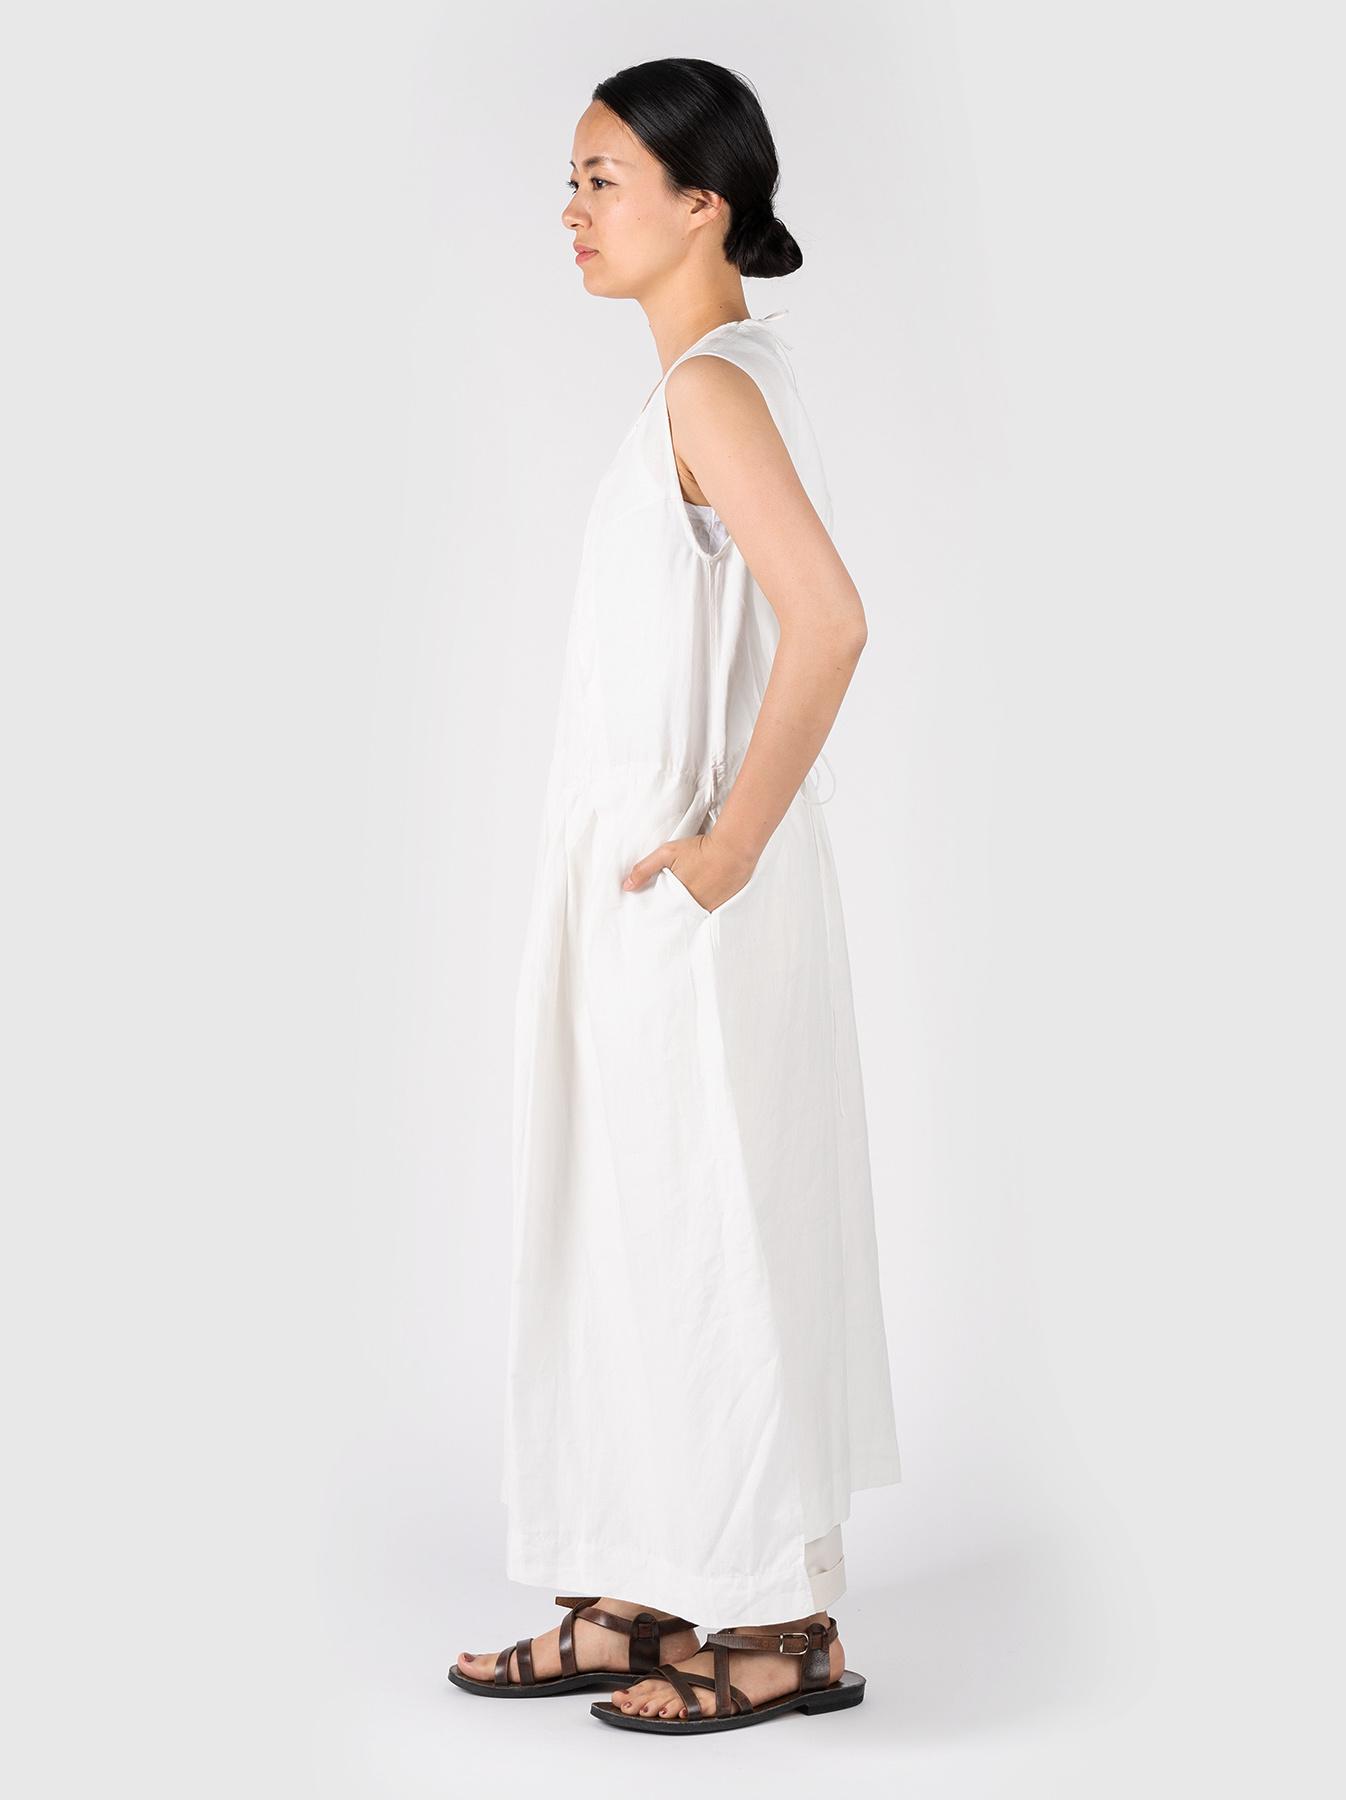 WH Linen Sleeveless Tuck Dress-3